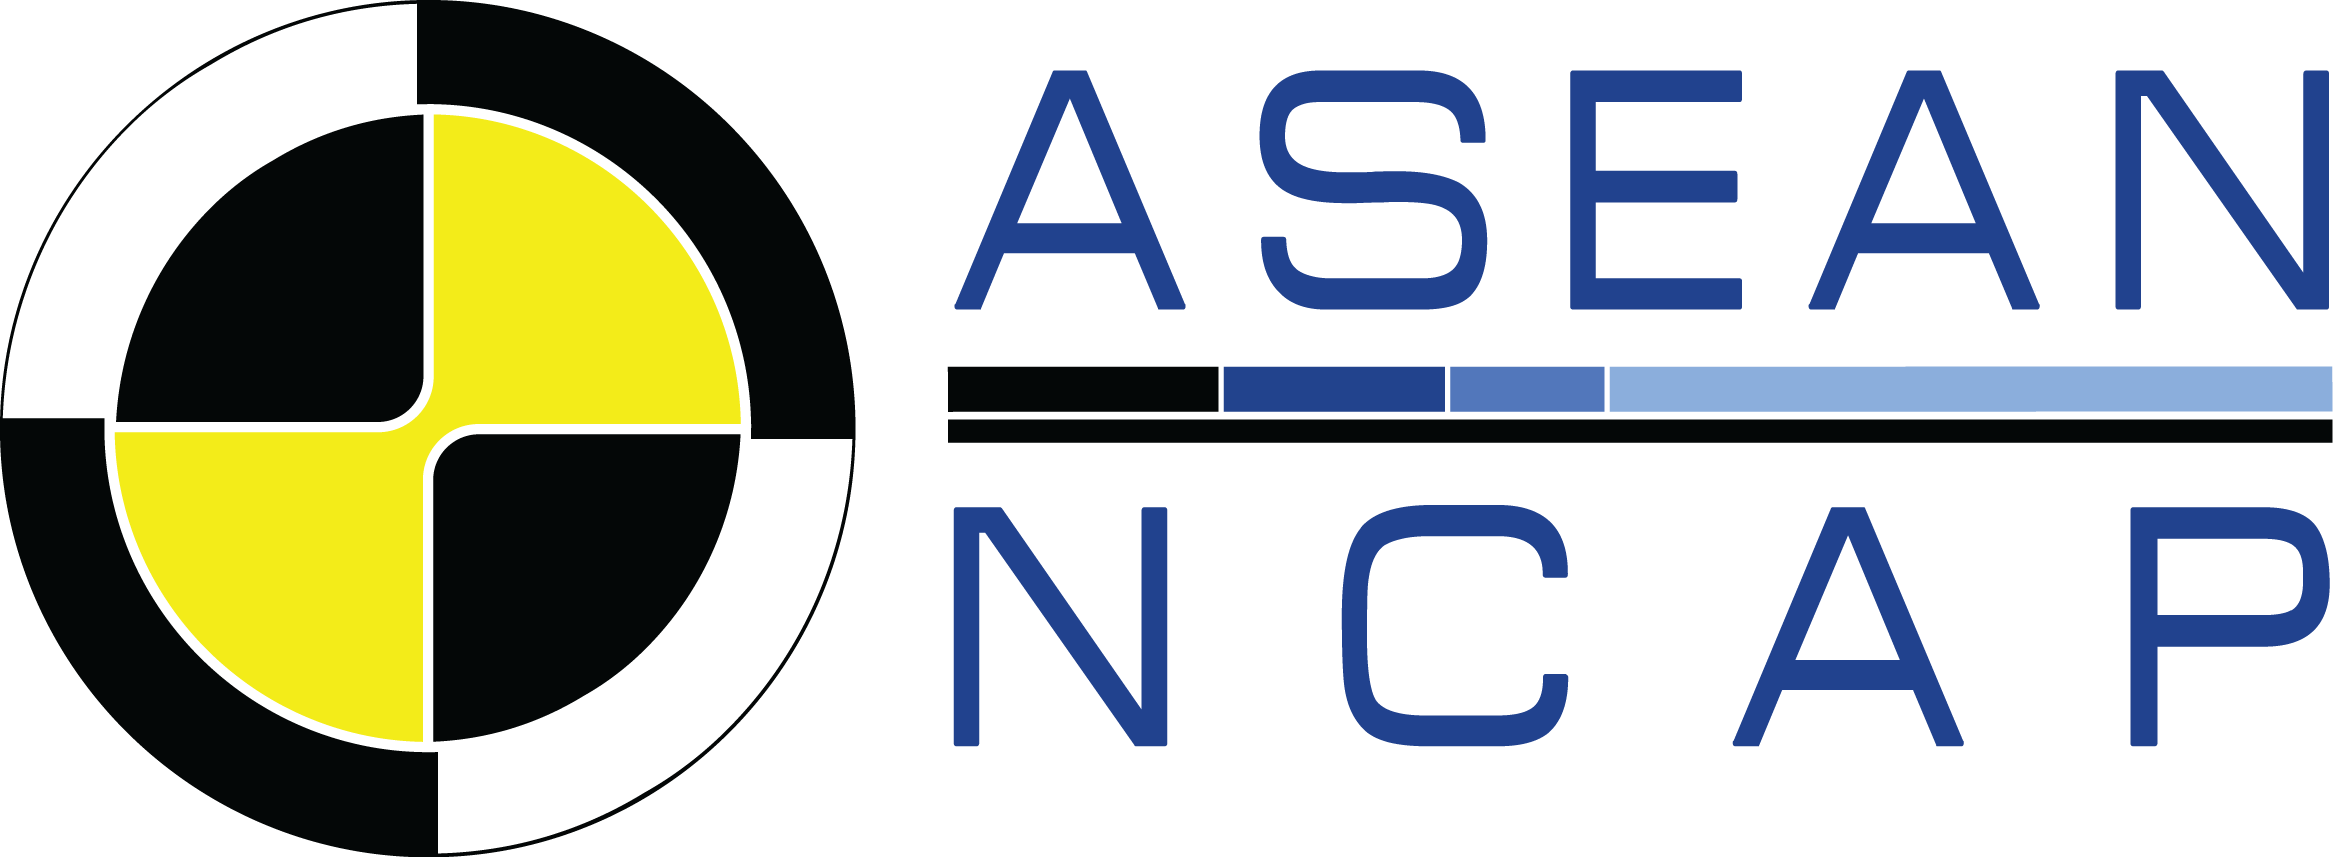 File:ASEAN NCAP LOGO.png - Wikimedia Commons